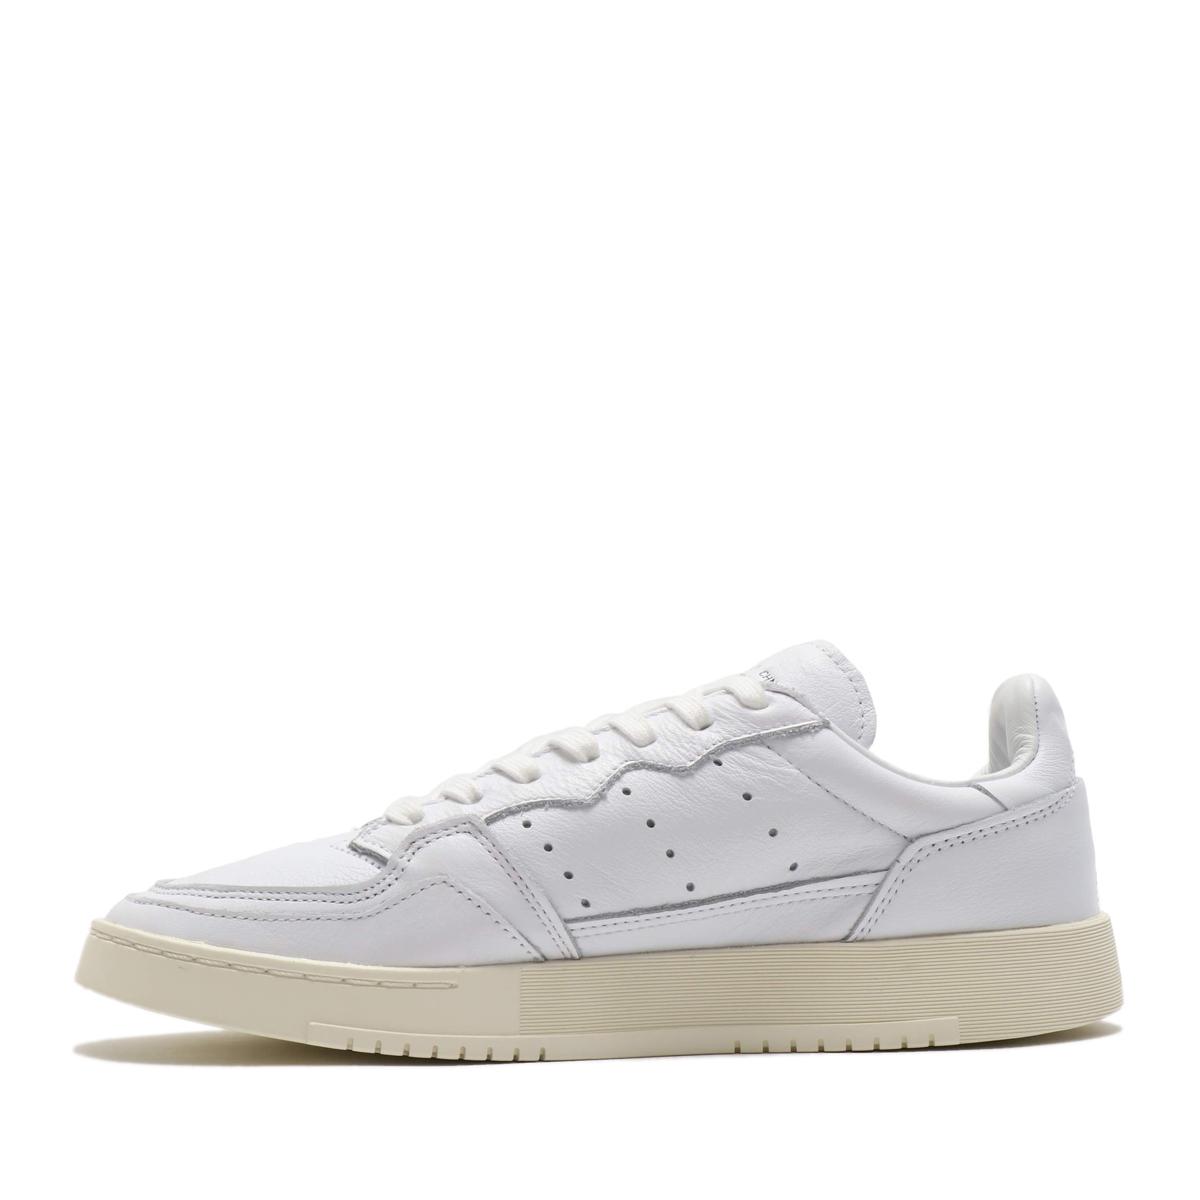 adidas Originals SUPERCOURT (RUNNING WHITERUNNING WHITEOFF WHITE) (Adidas originals supermarket coat)